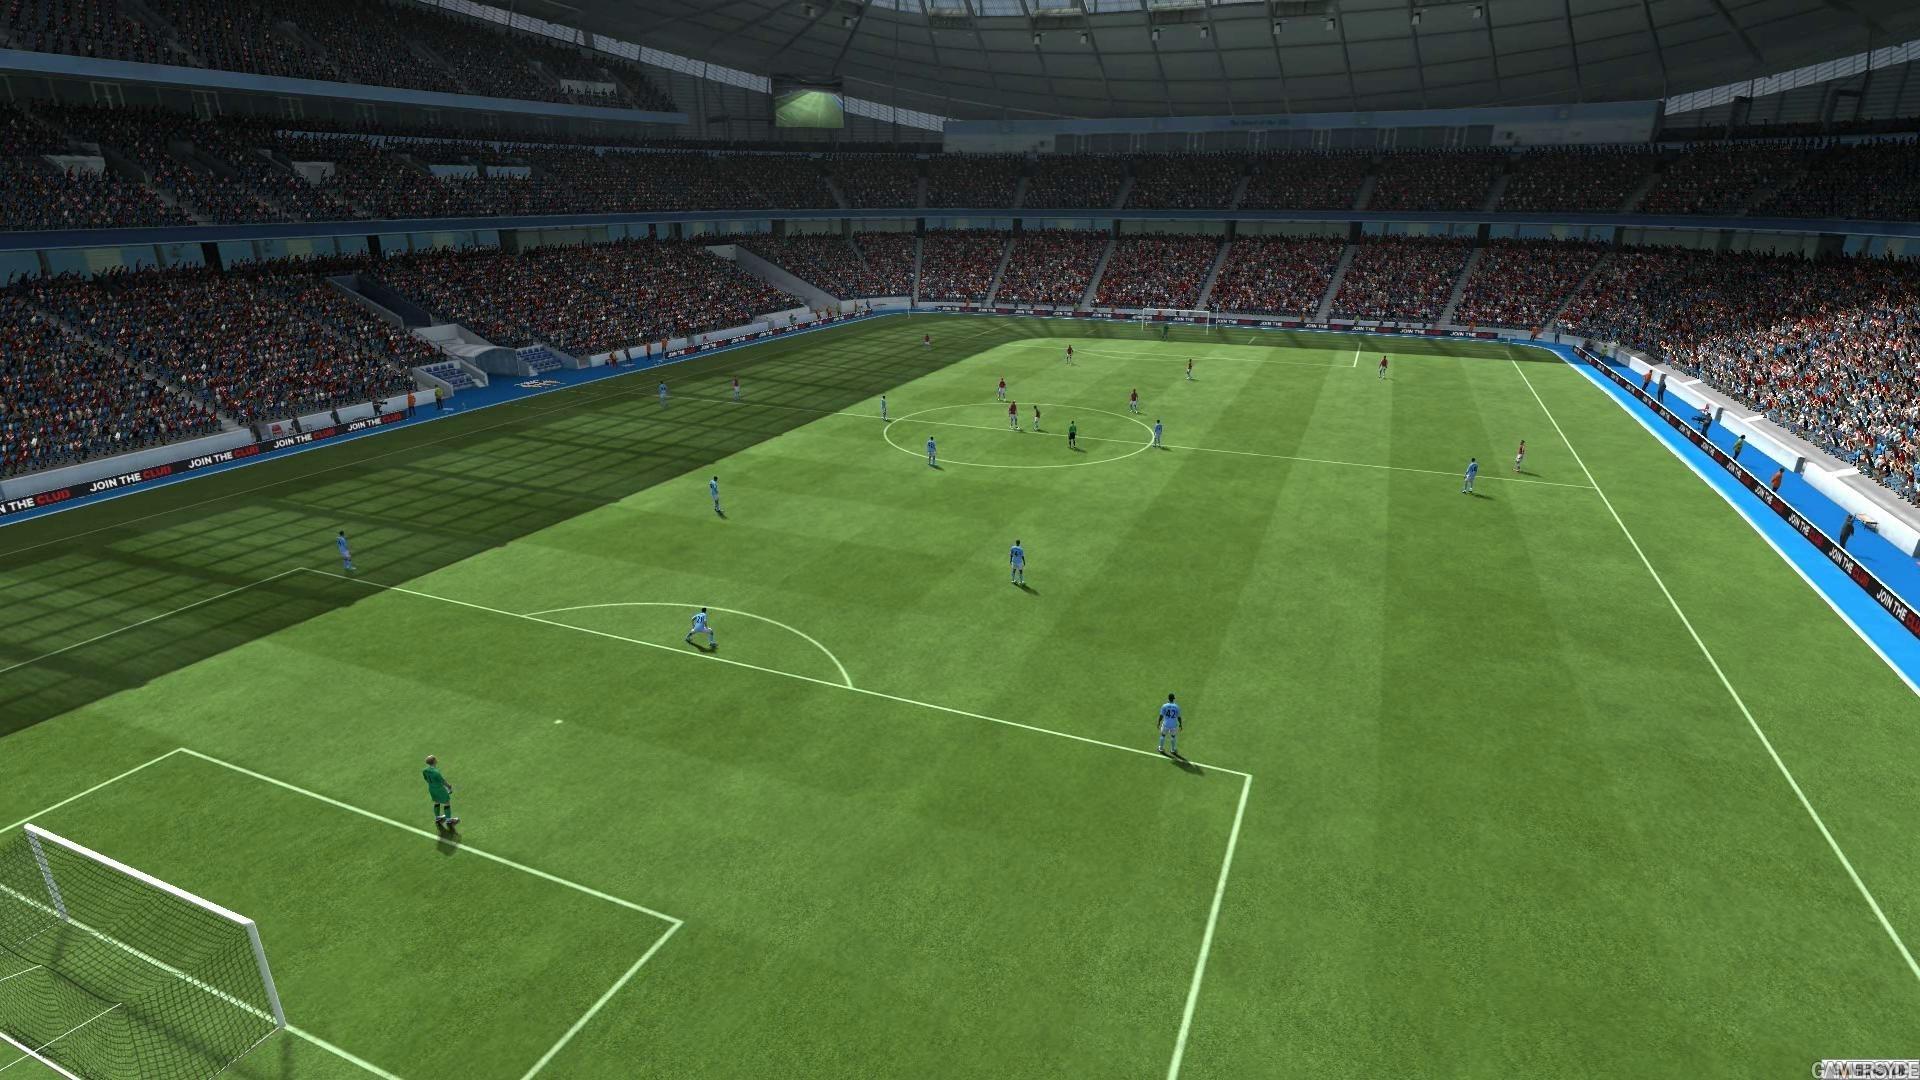 image fifa 13 20261 2509 0012 تصاویر جدید از بازی FIFA 13